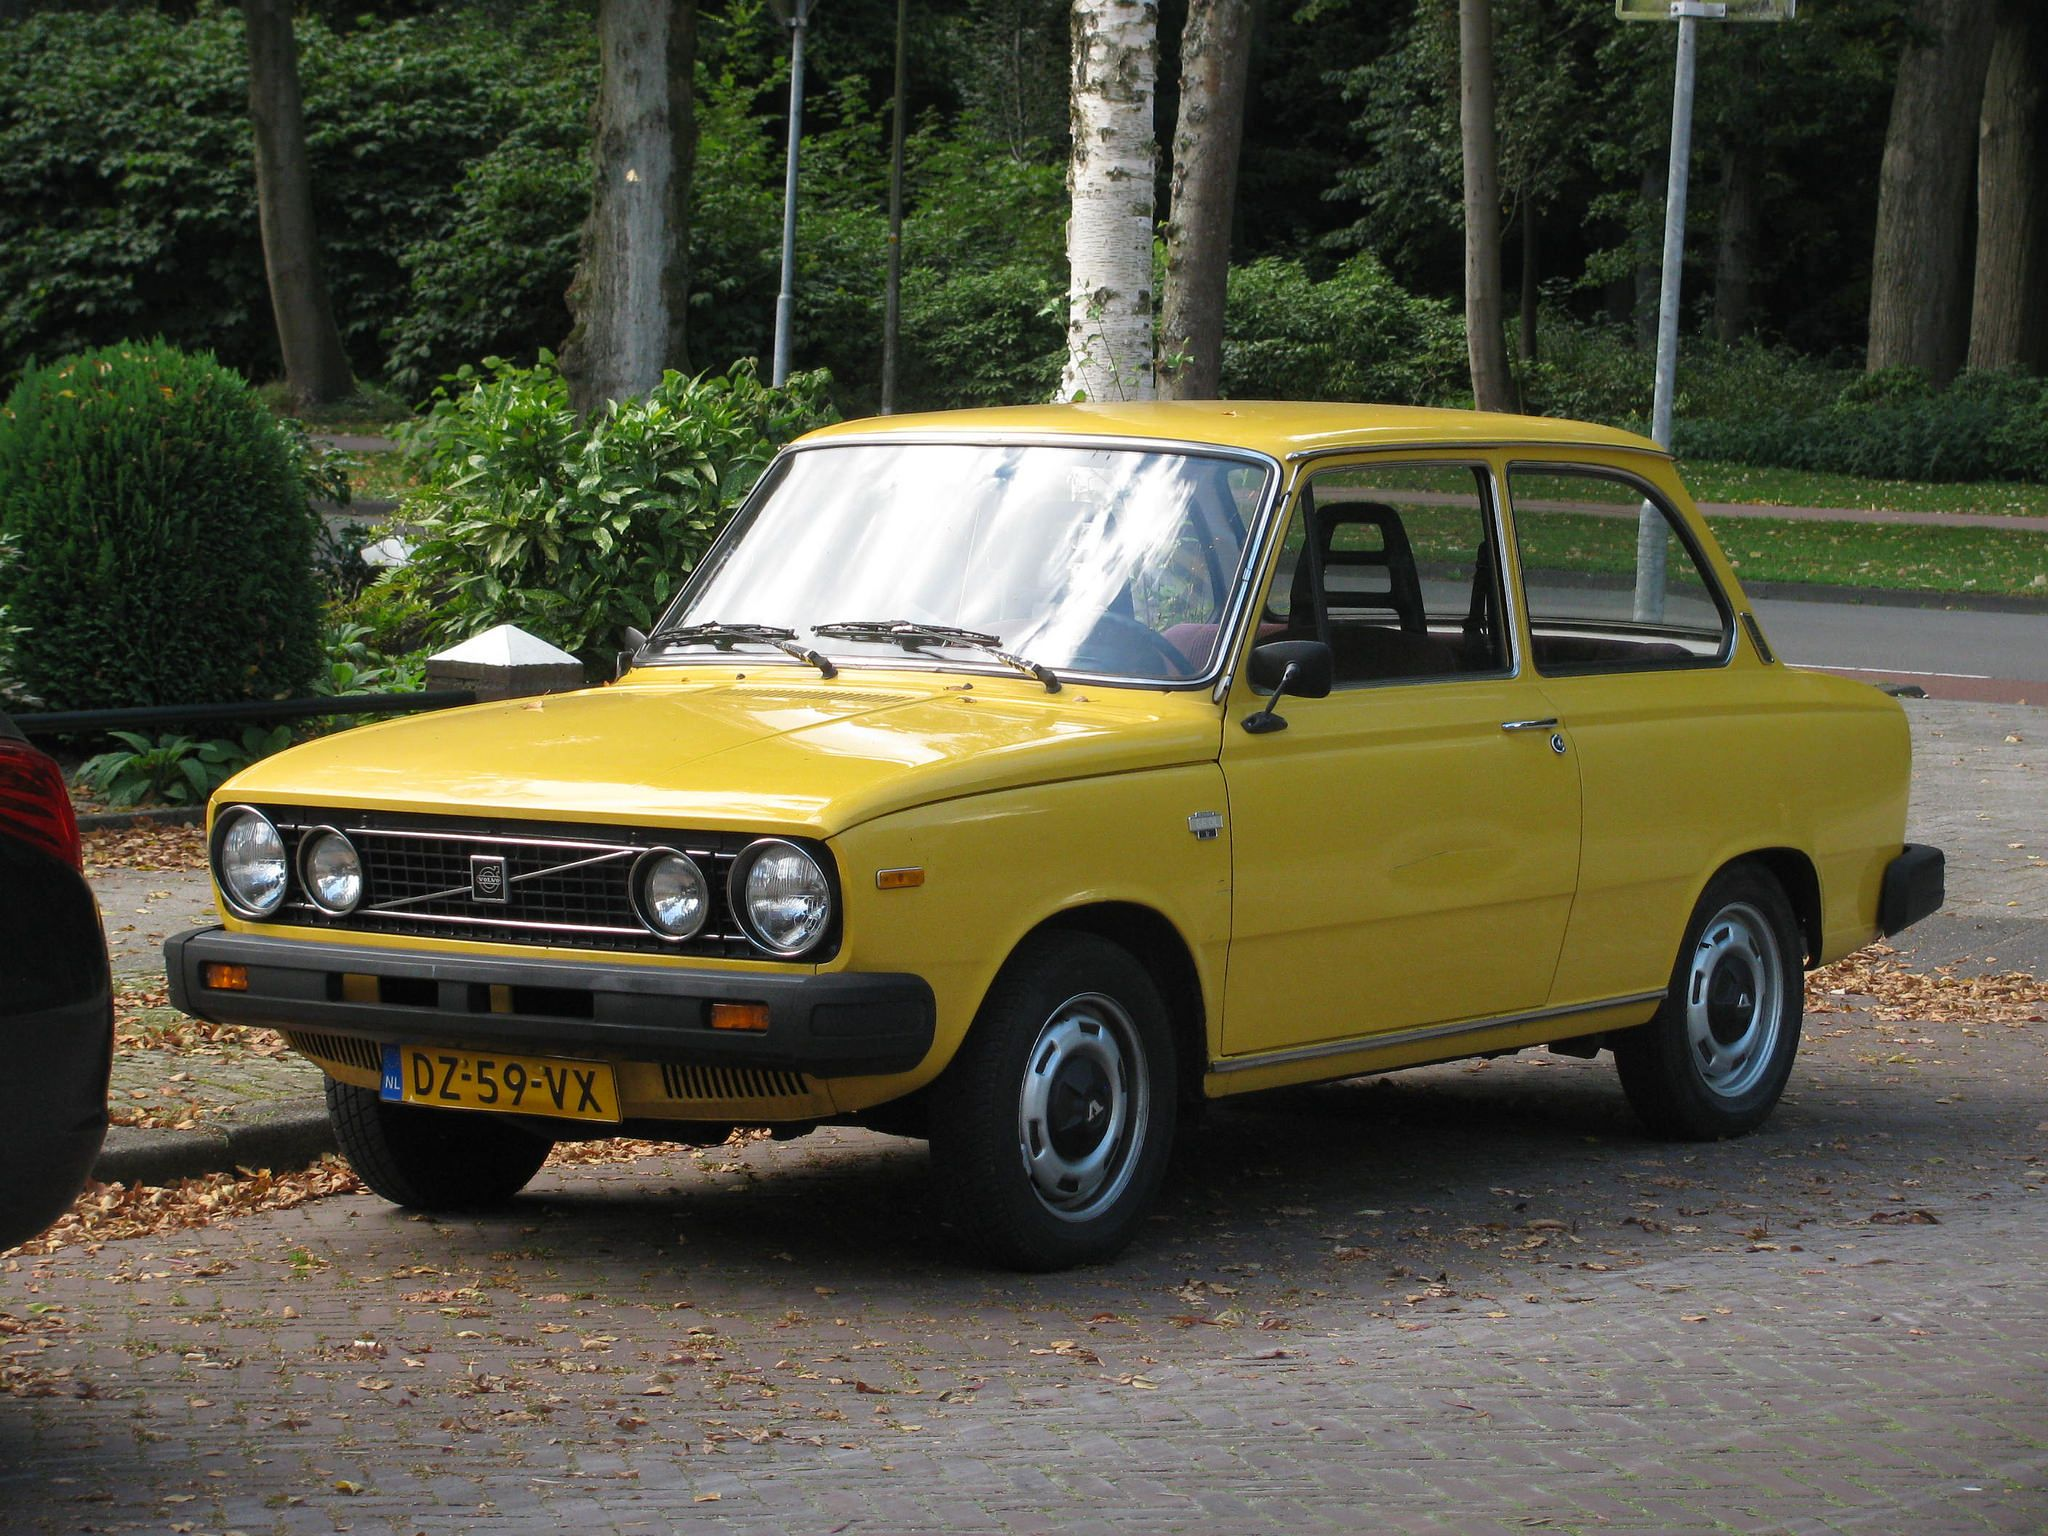 Volvo 66dl 06 1979 Dz 59 Vx Oldtimers